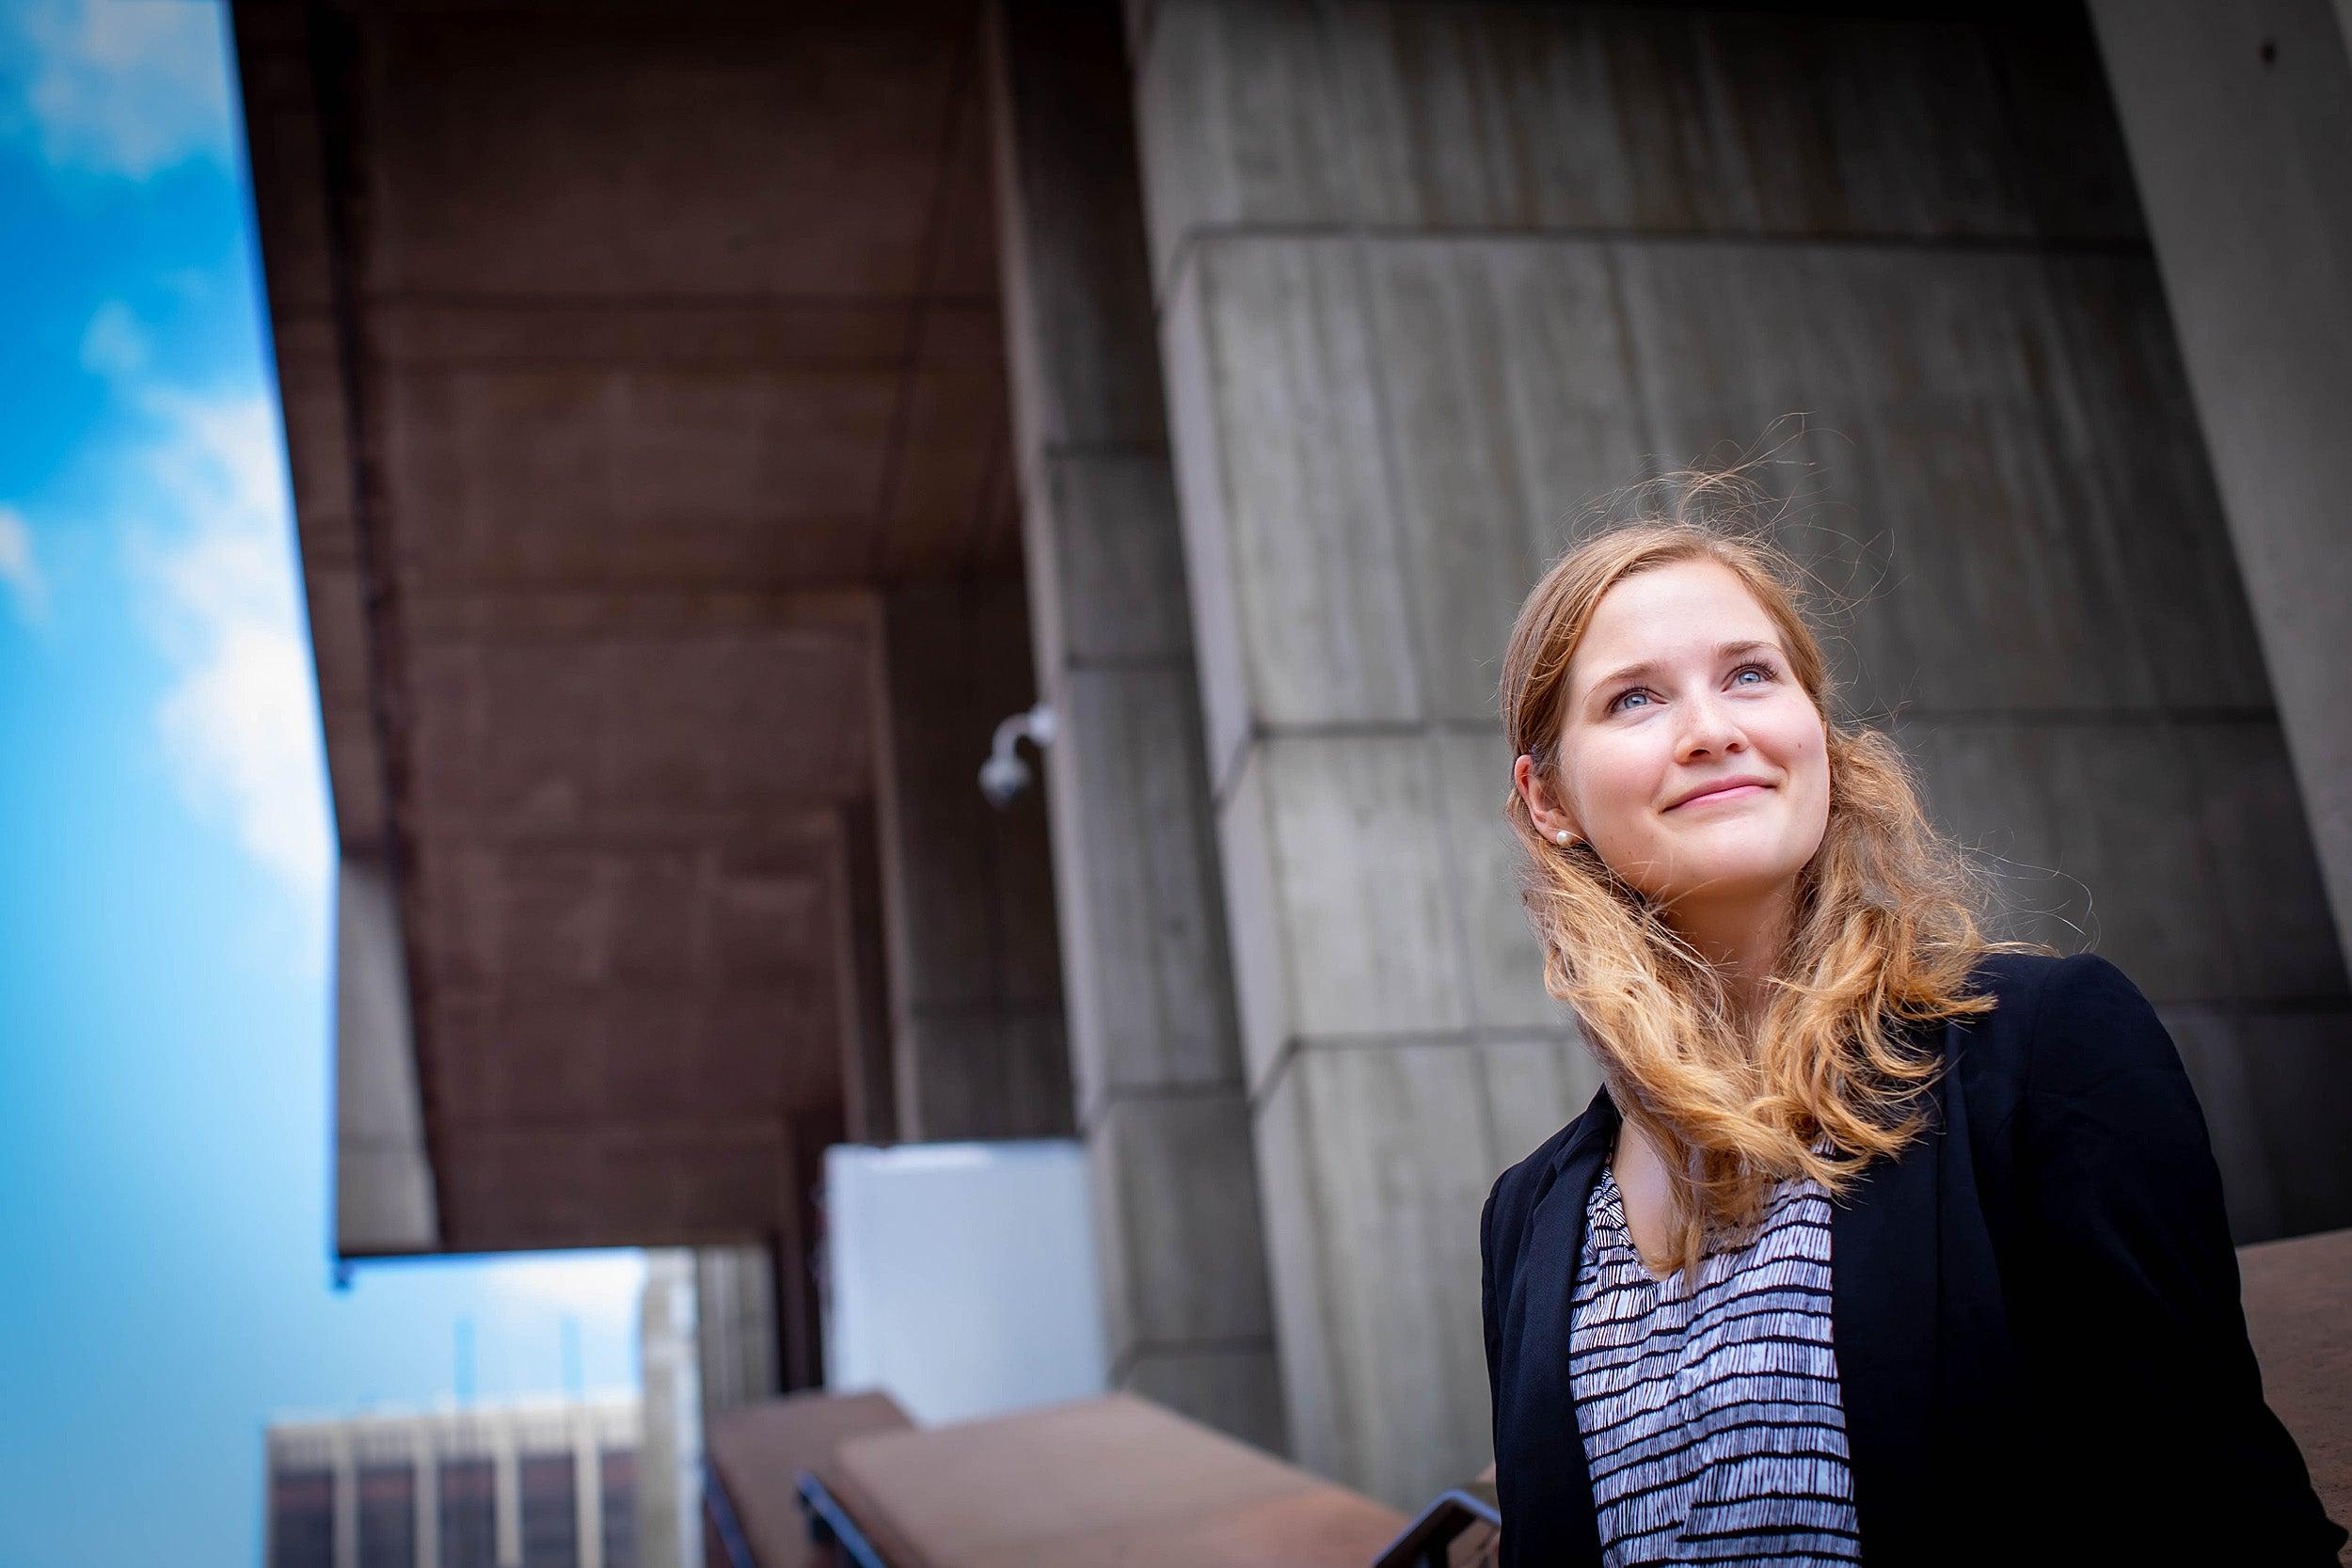 Local student serves as 2019 Harvard Presidential City of Boston Fellow